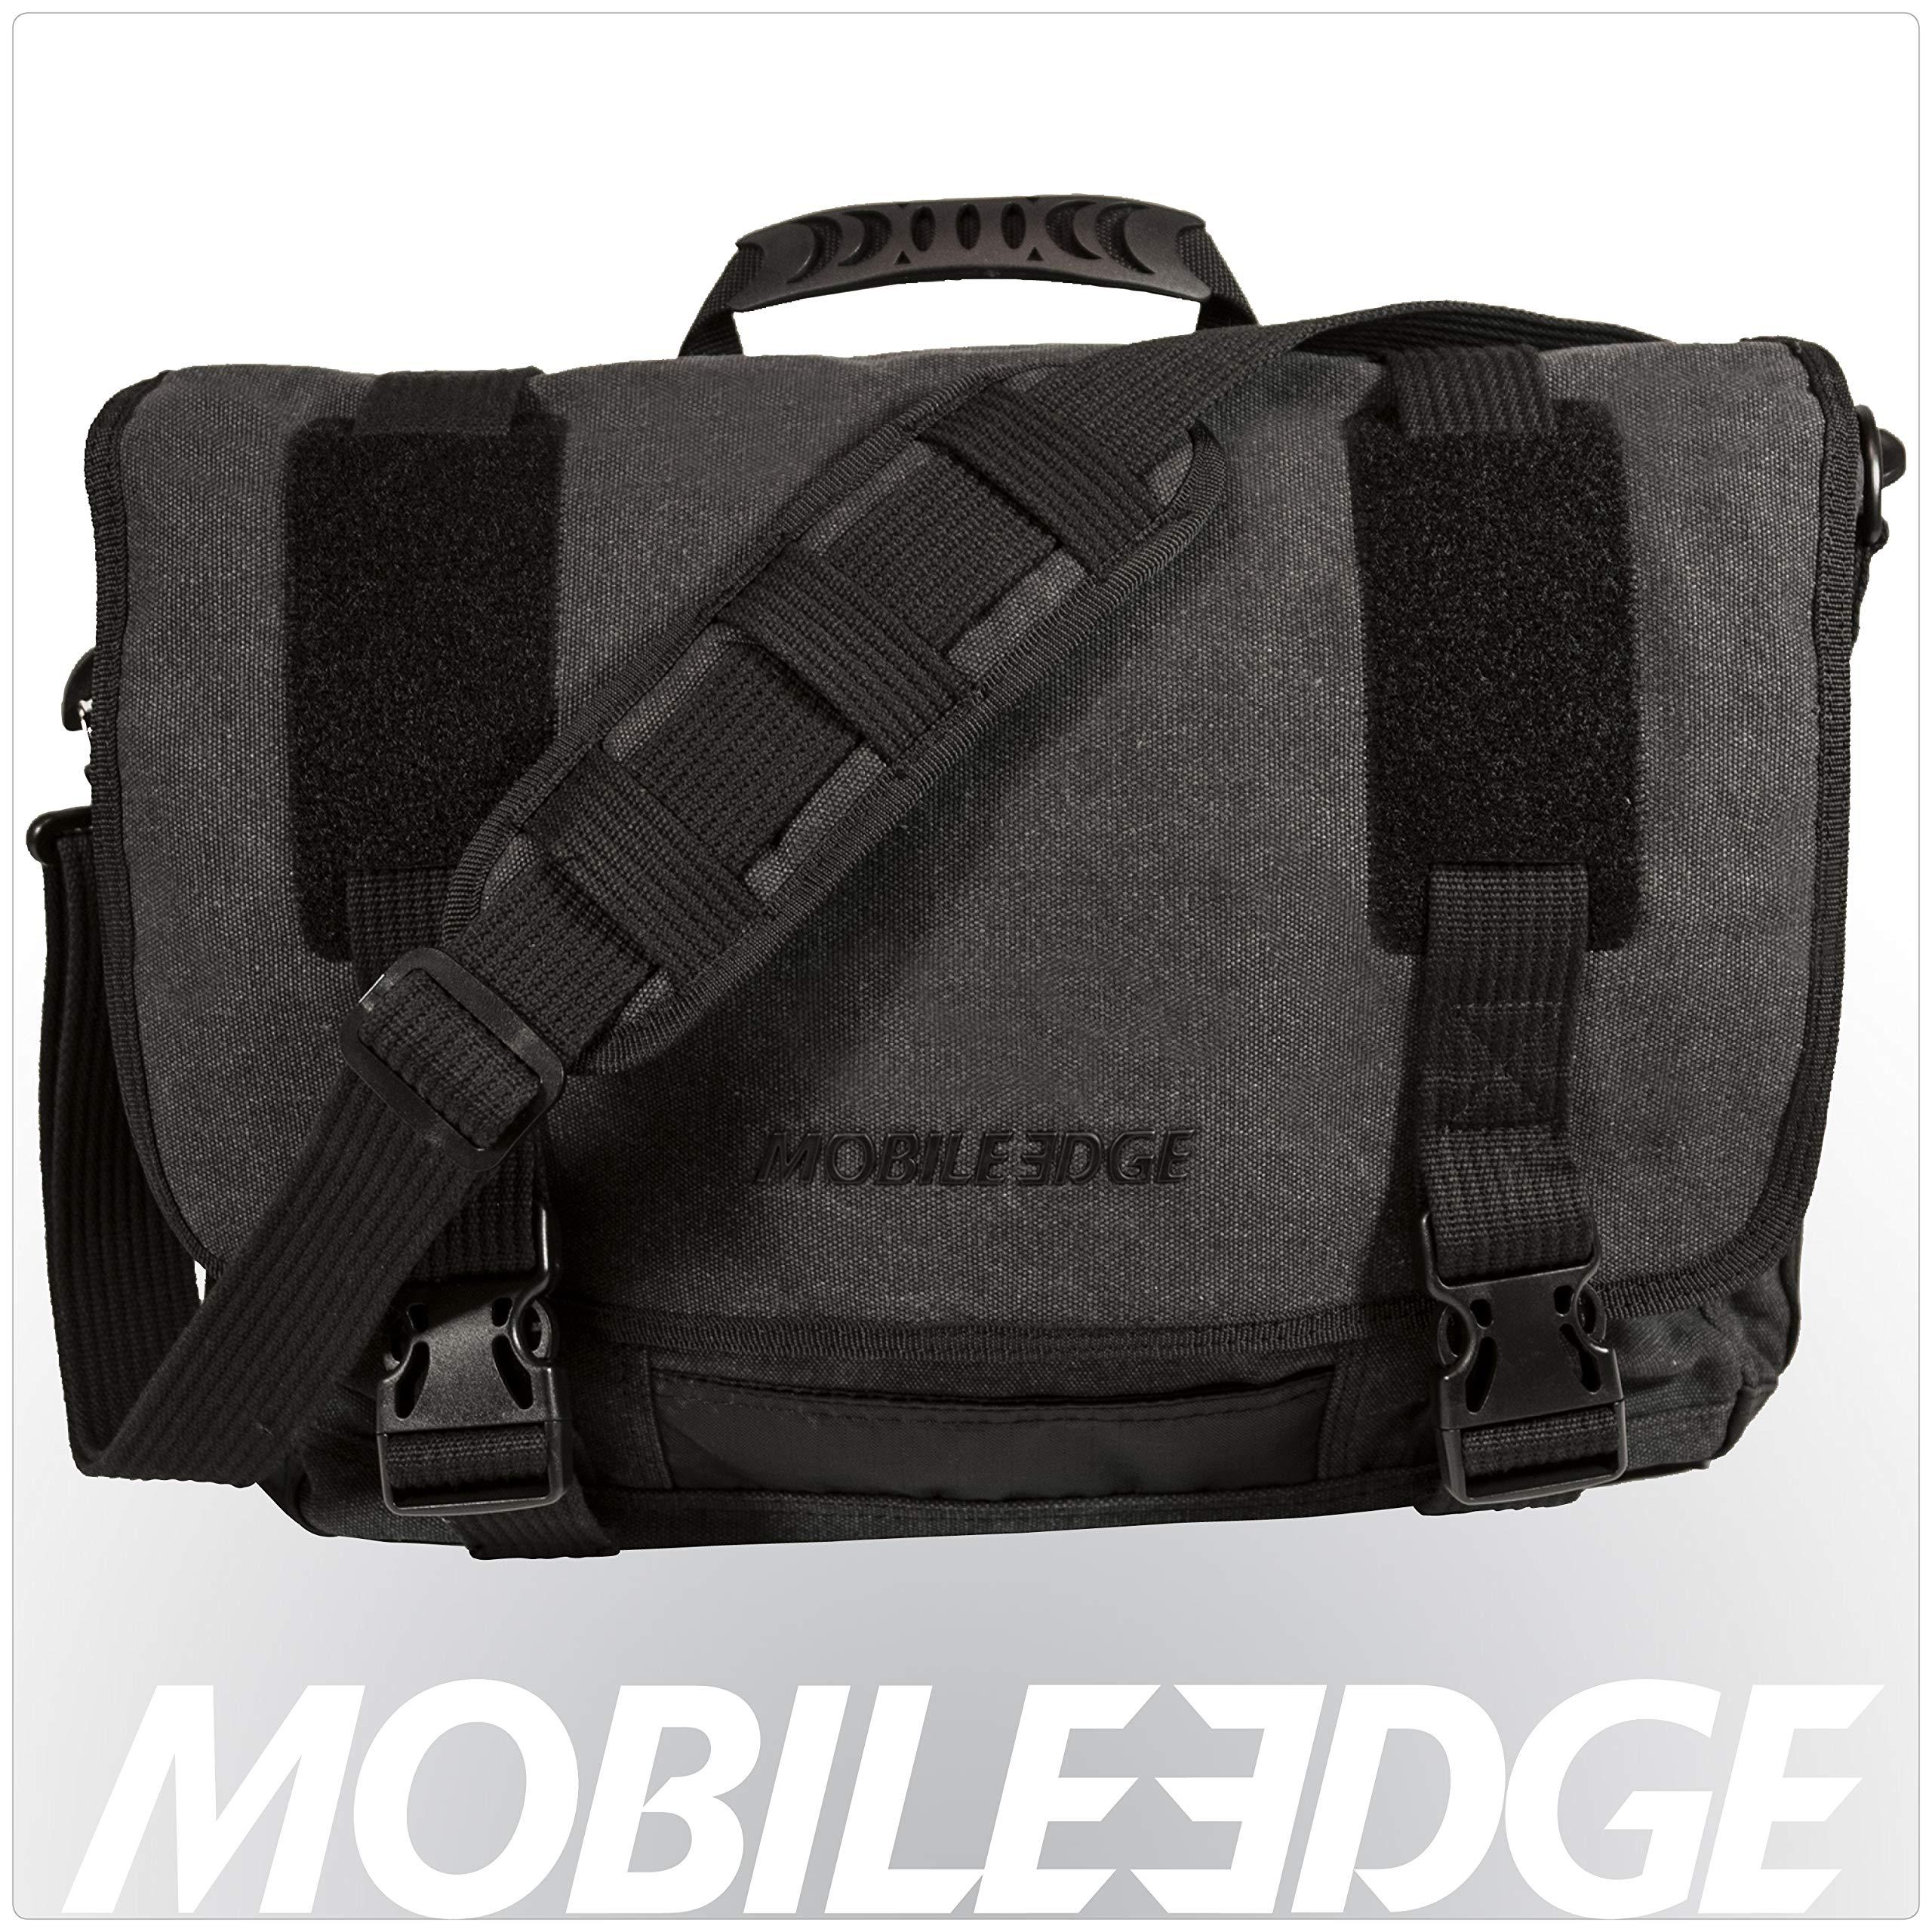 "Mobile Edge Laptop/Tablet 14.1"" Ultrabook or 15"" MacBook Eco-Friendly Messenger Bag, Cotton Canvas, Charcoal for Men, Women, Business, Student MEUME5 Ash"